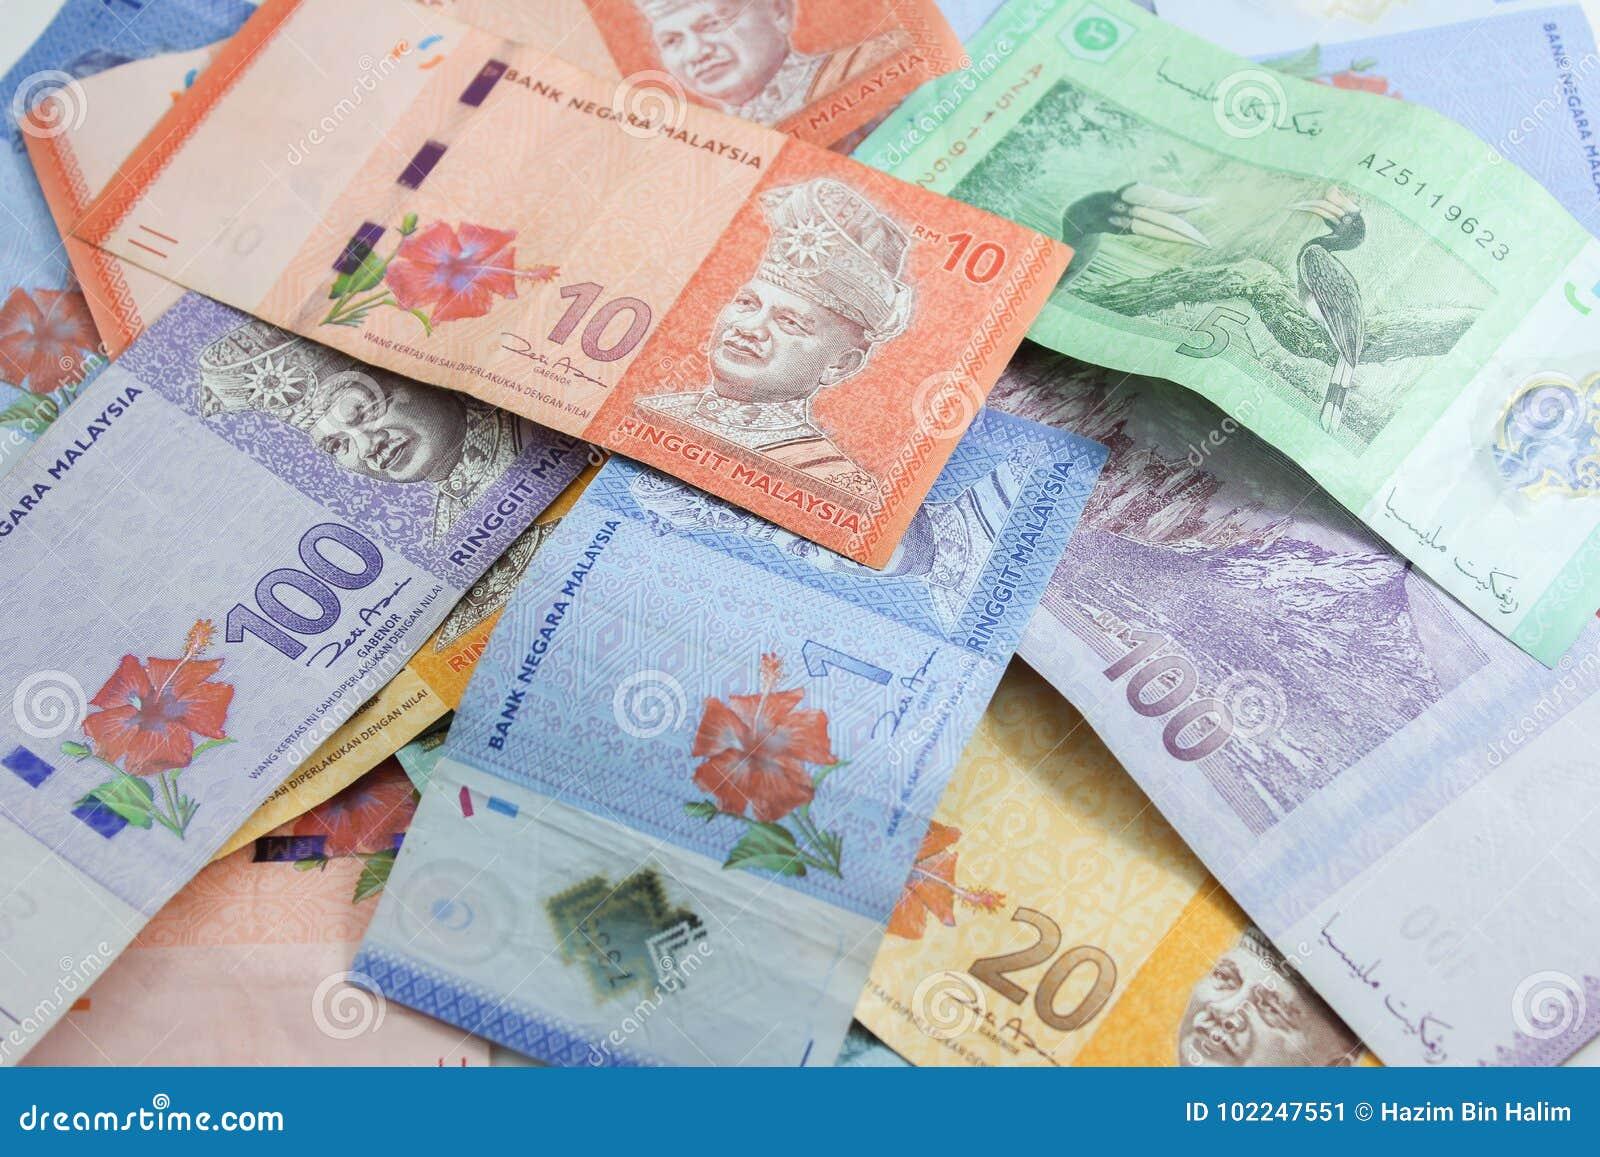 Closeup Shot Of Ringgit Malaysia Stock Image - Image of cash